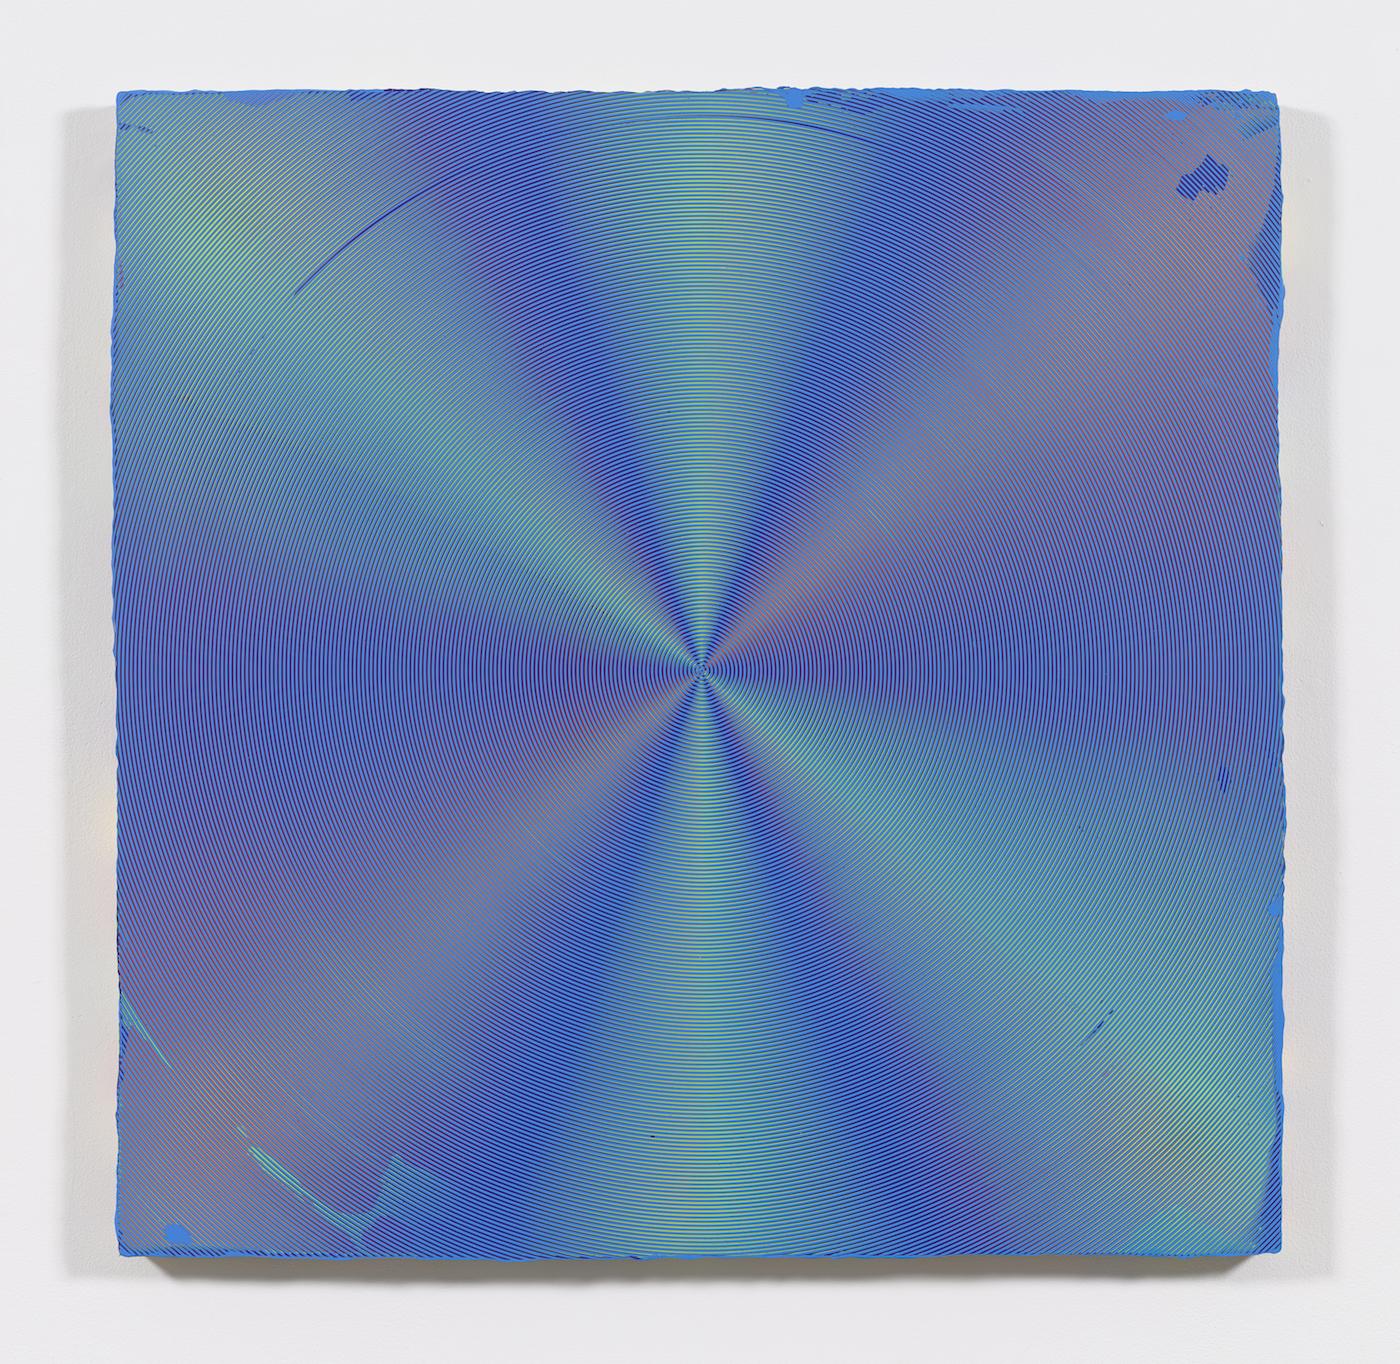 Anoka Faruqee, 2017P-06 (Circle), 2017, acrylic on linen on panel, 45 x 45 inches (courtesy of the artist and Koenig & Clinton, New York, photo: Jeffrey Sturges)